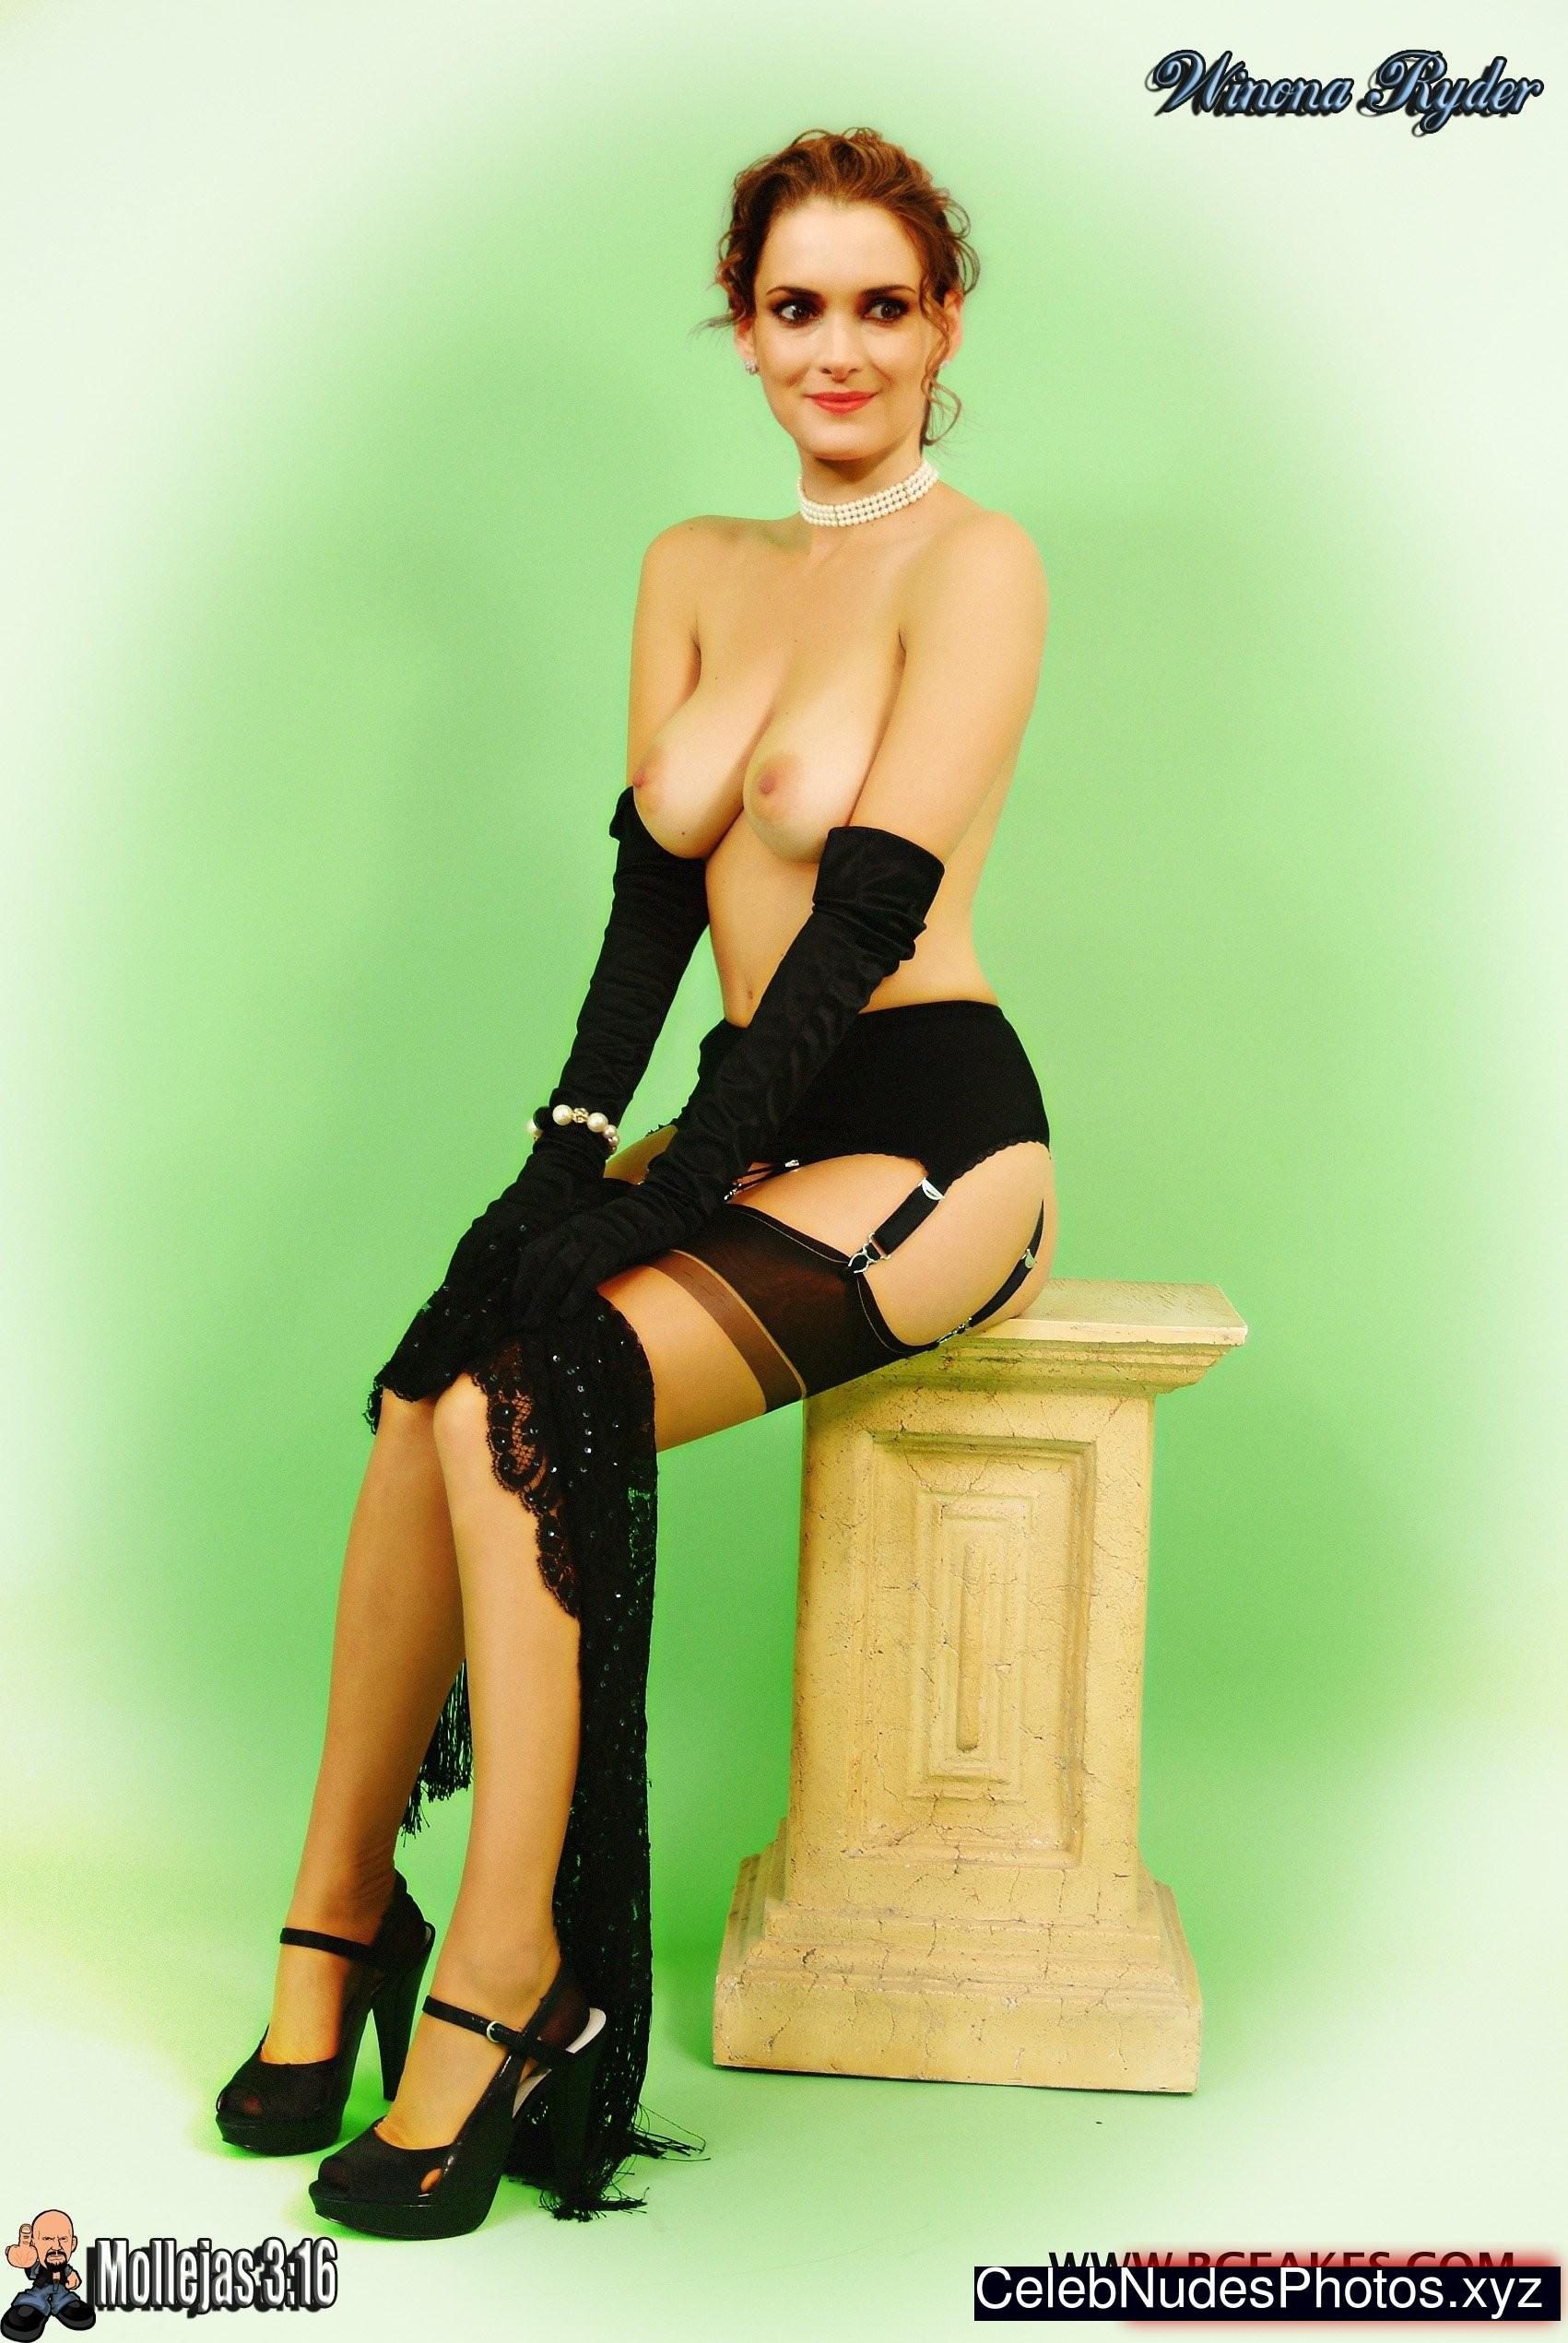 Claudia romani sexy 63 pics nude (89 image)